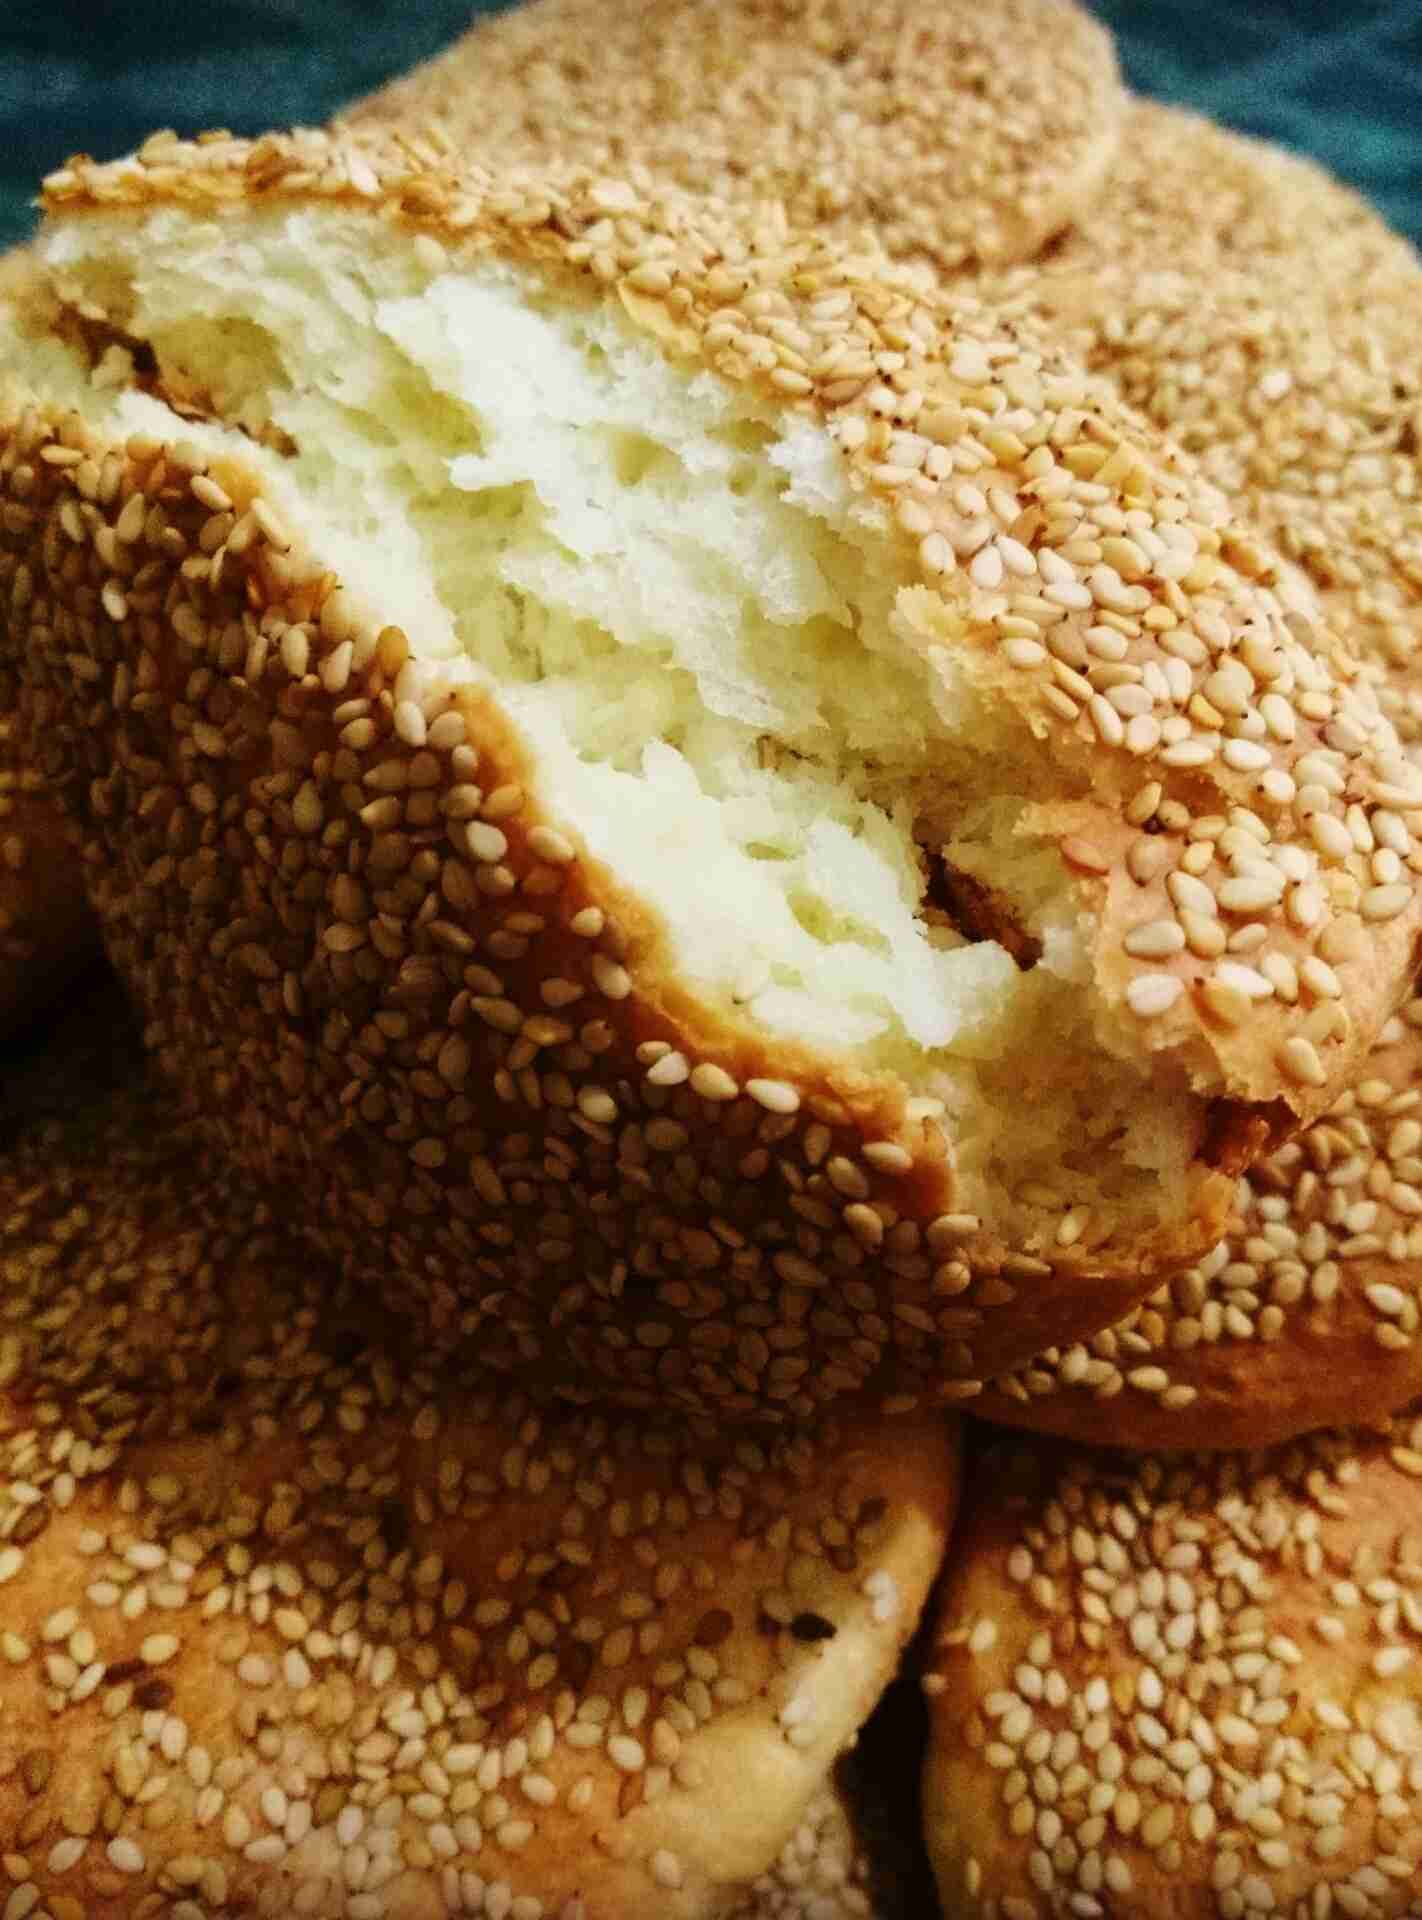 قرص بالسمسم زاكي Artisan Bread Sweet Pastries Bread Cones